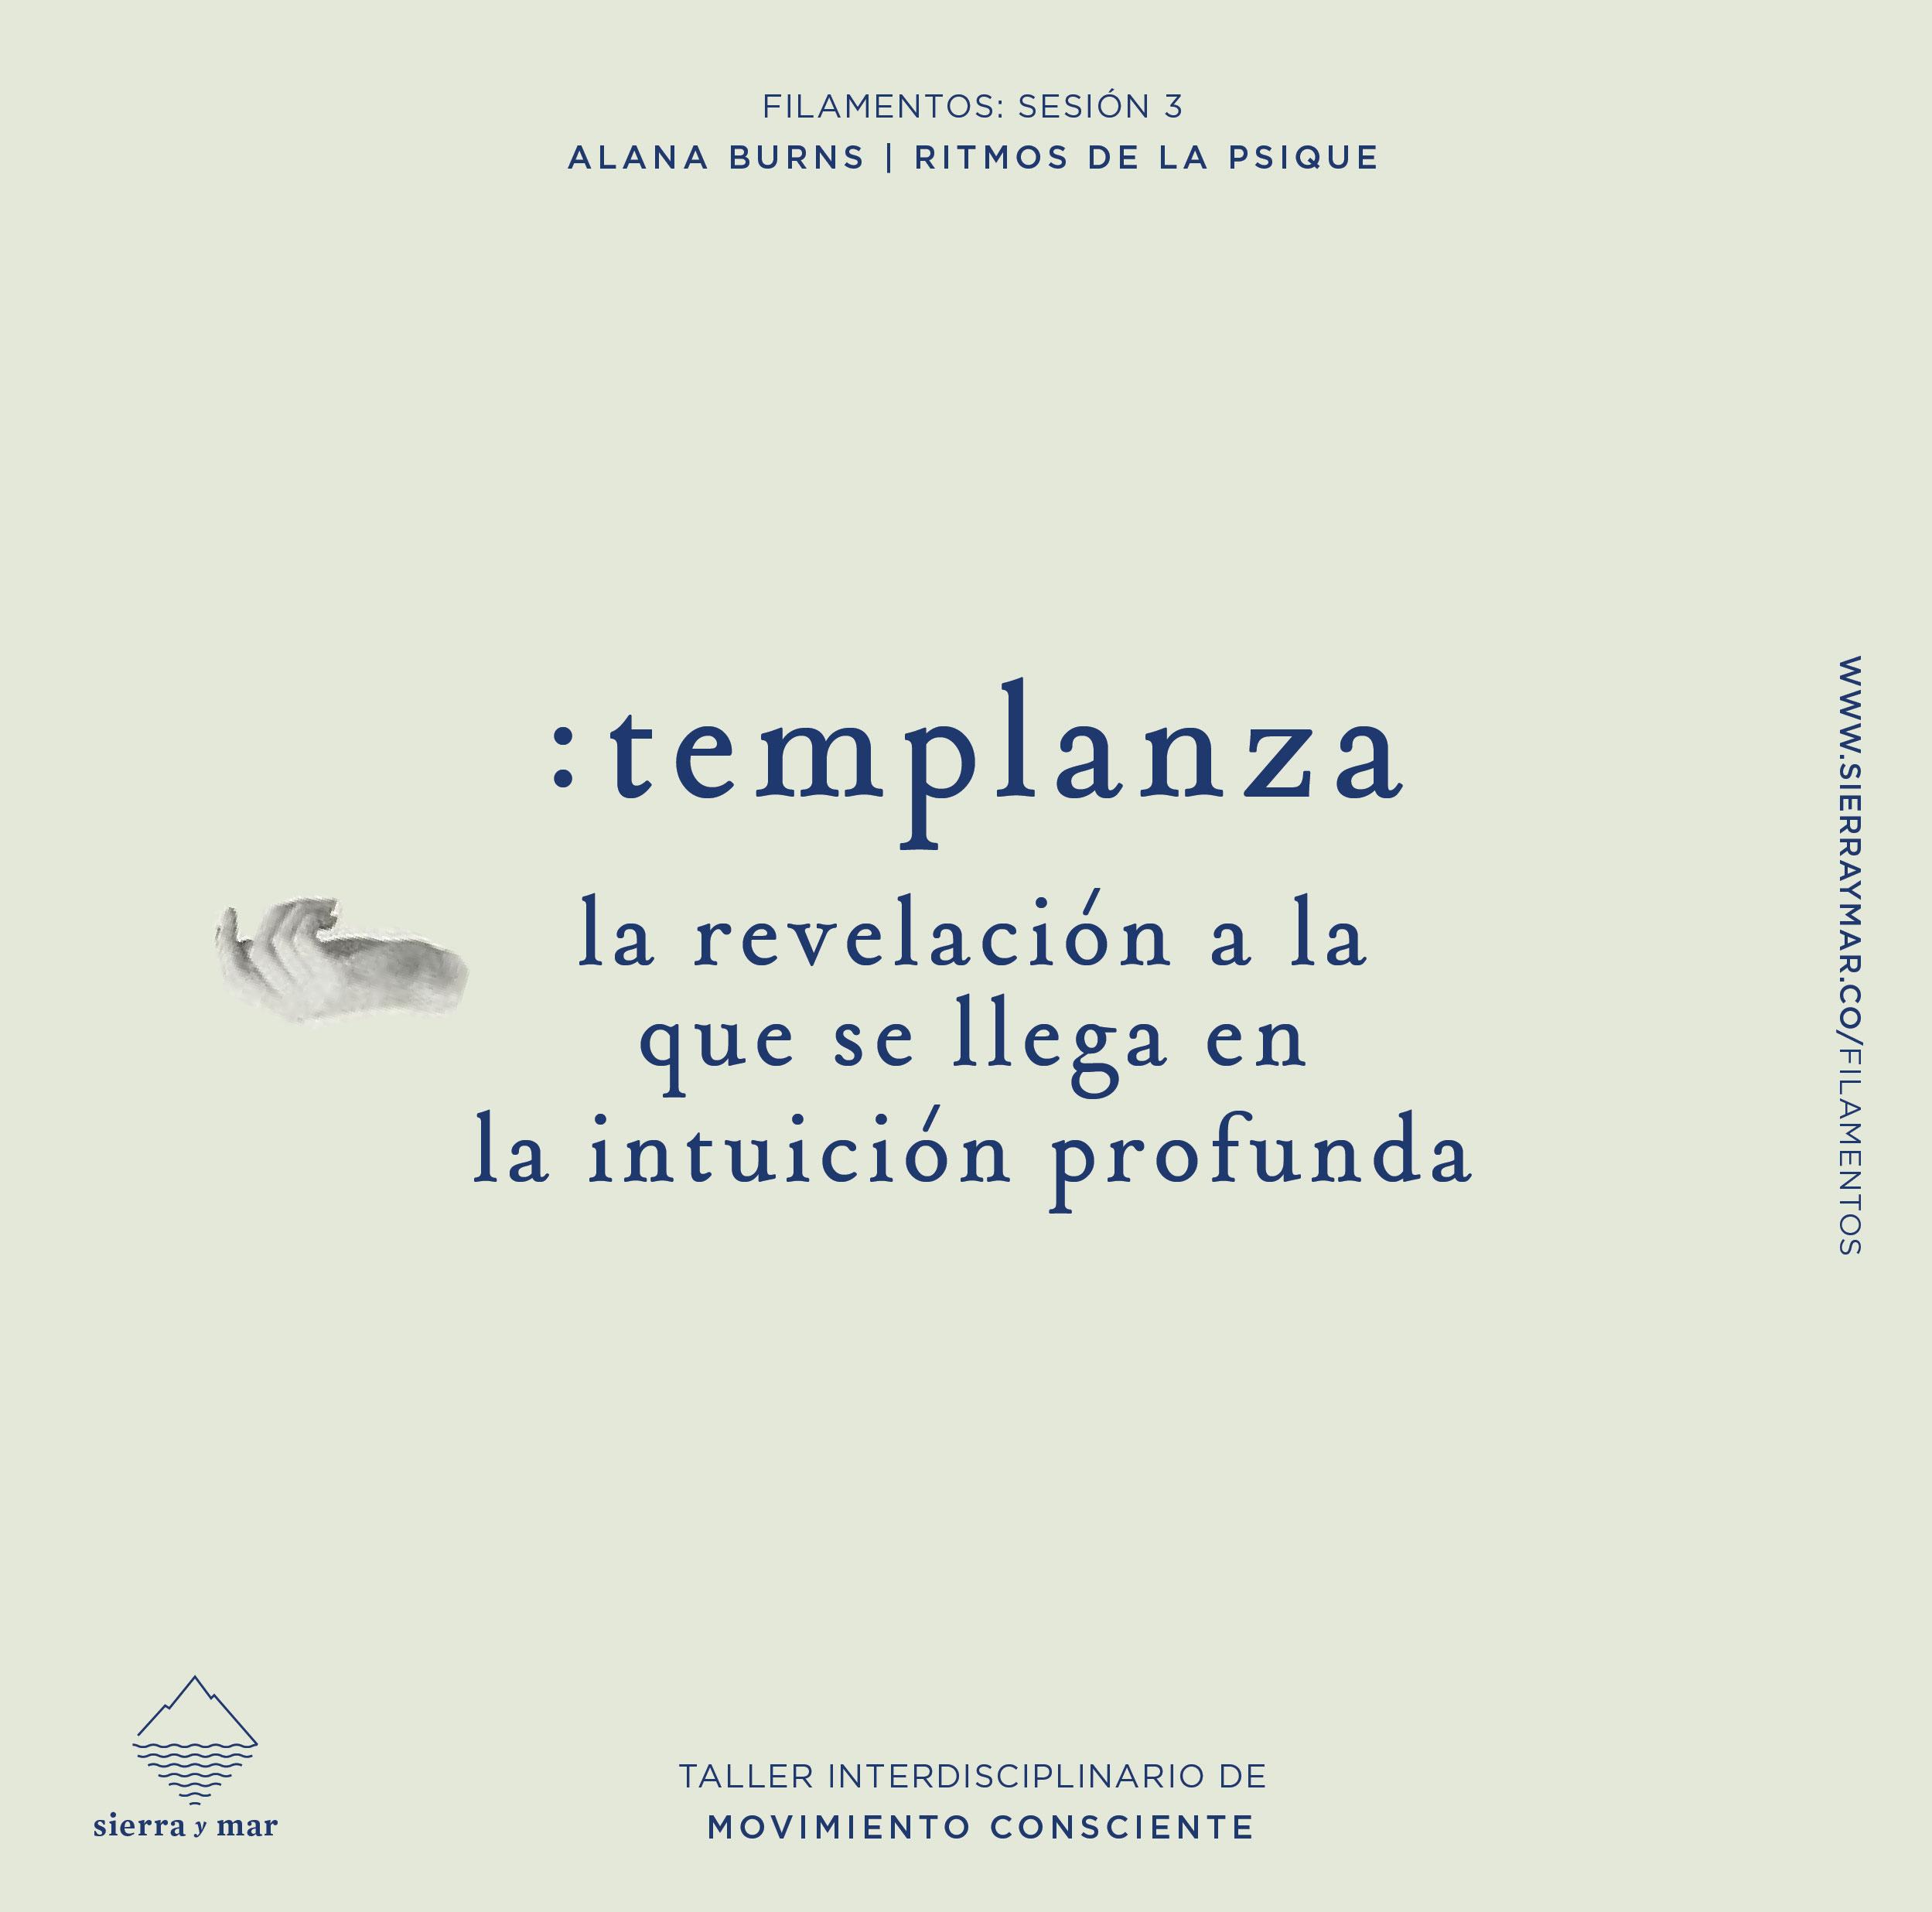 Filamentos-texts-21.jpg